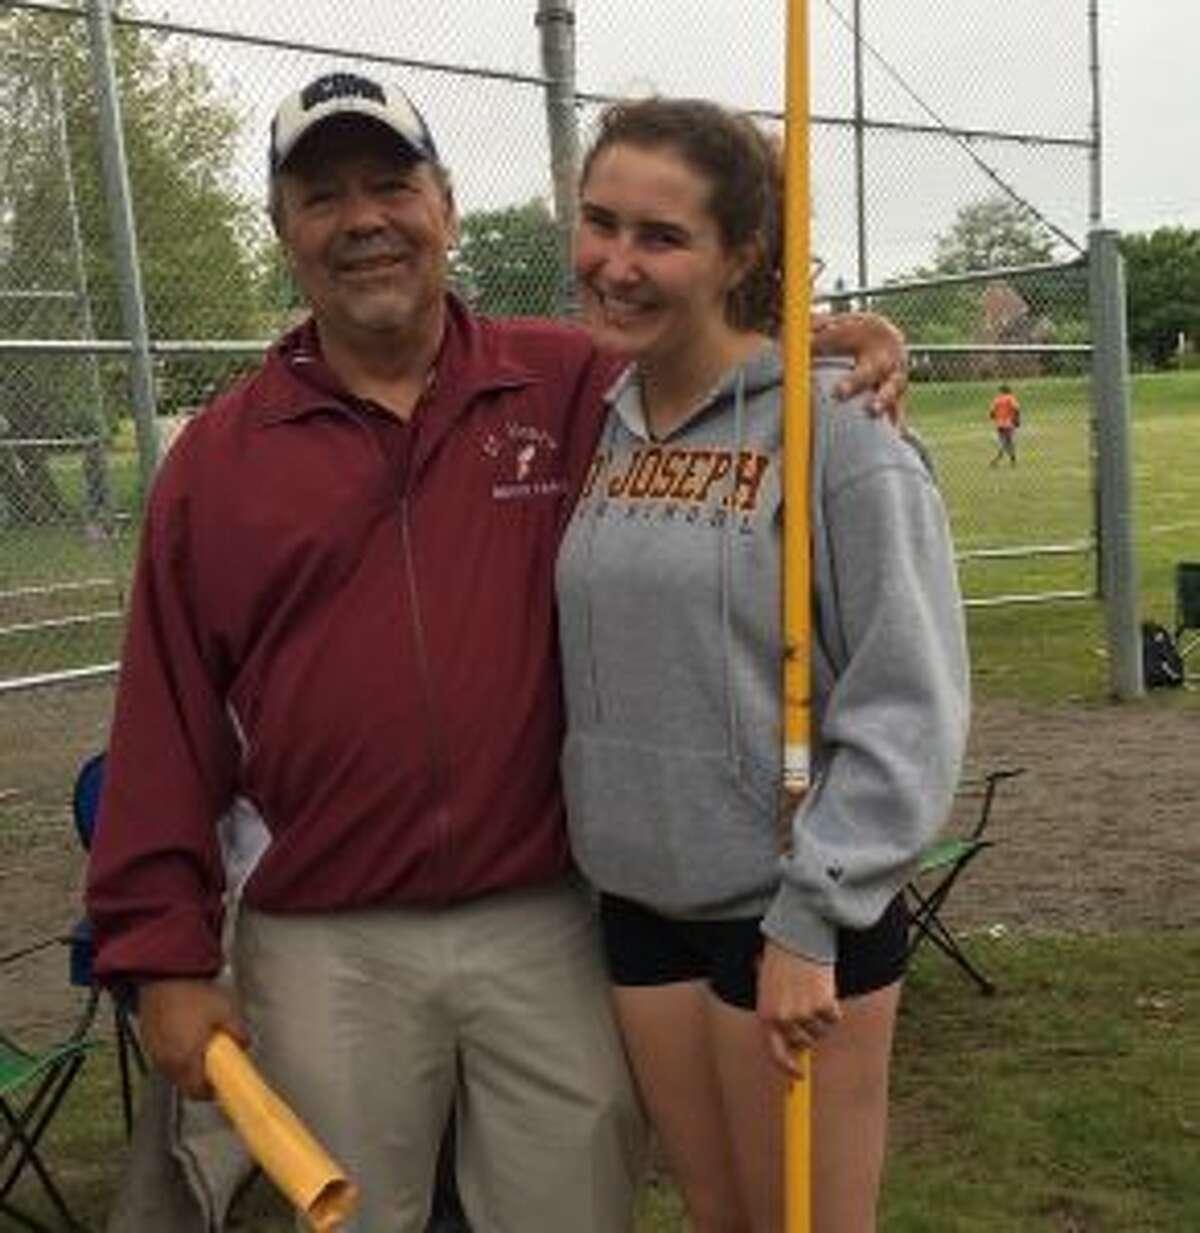 State Open champion Sophia Jagoe-Seidl and Cadet coach Gary Schmidlin.